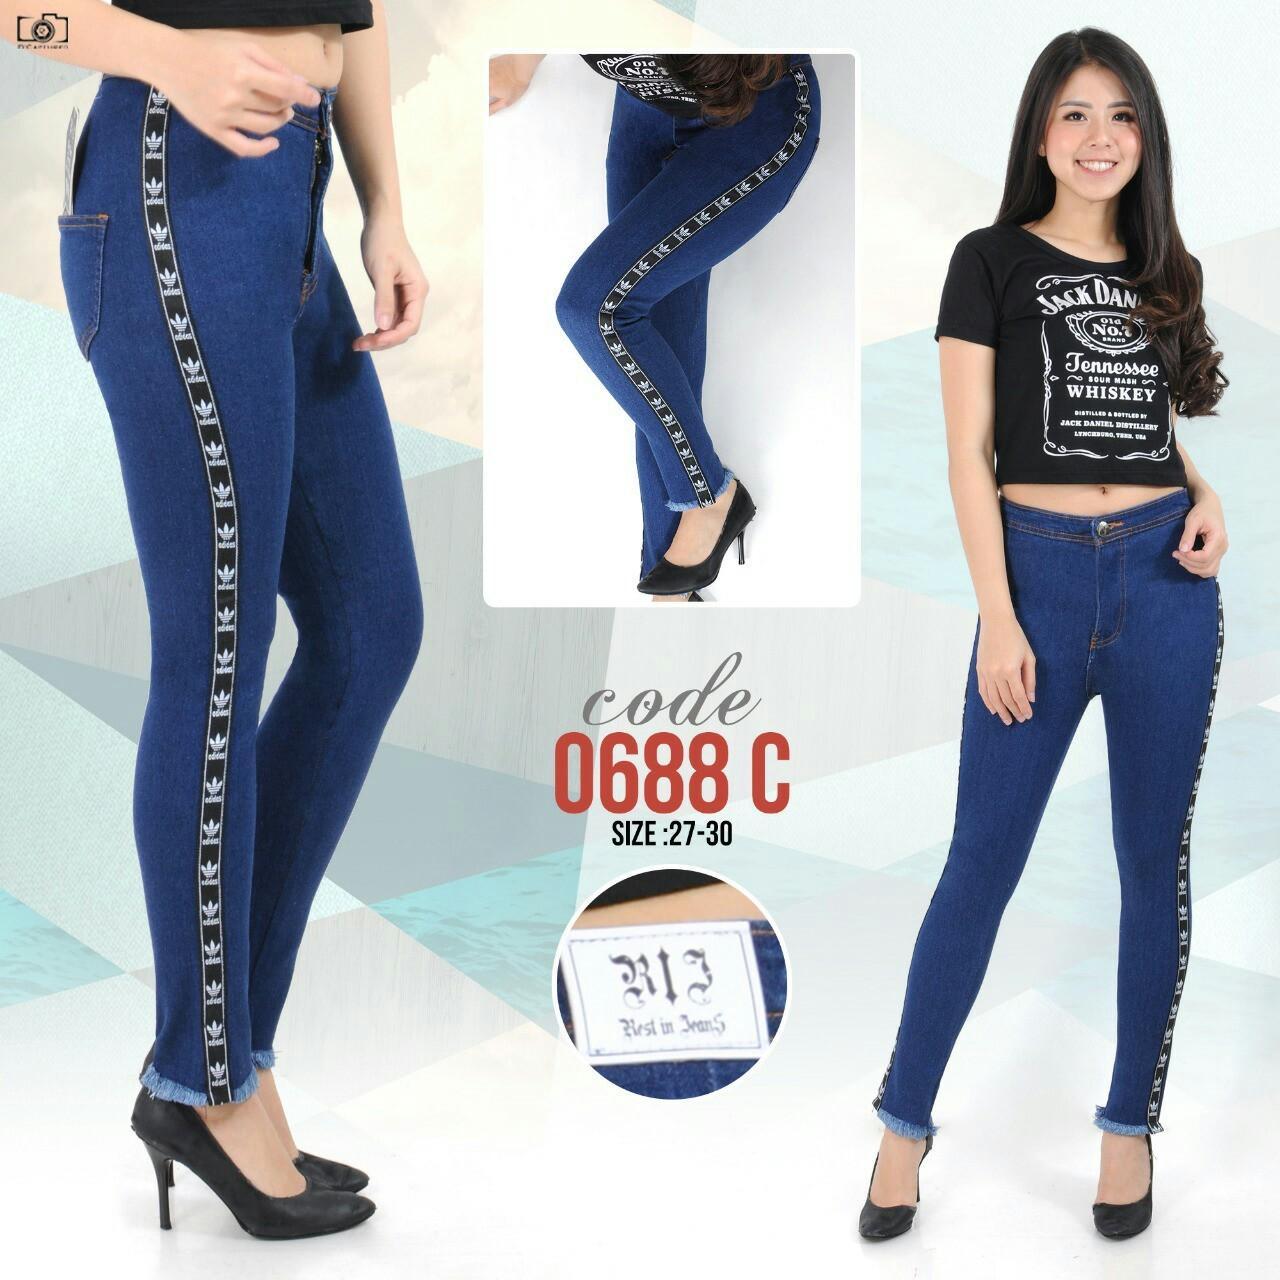 NM Jeans Blue 5 Ukuran 27-30 Celana Panjang Soft Jeans Wanita Elegant  Exclusive New 12f2b7c3c6